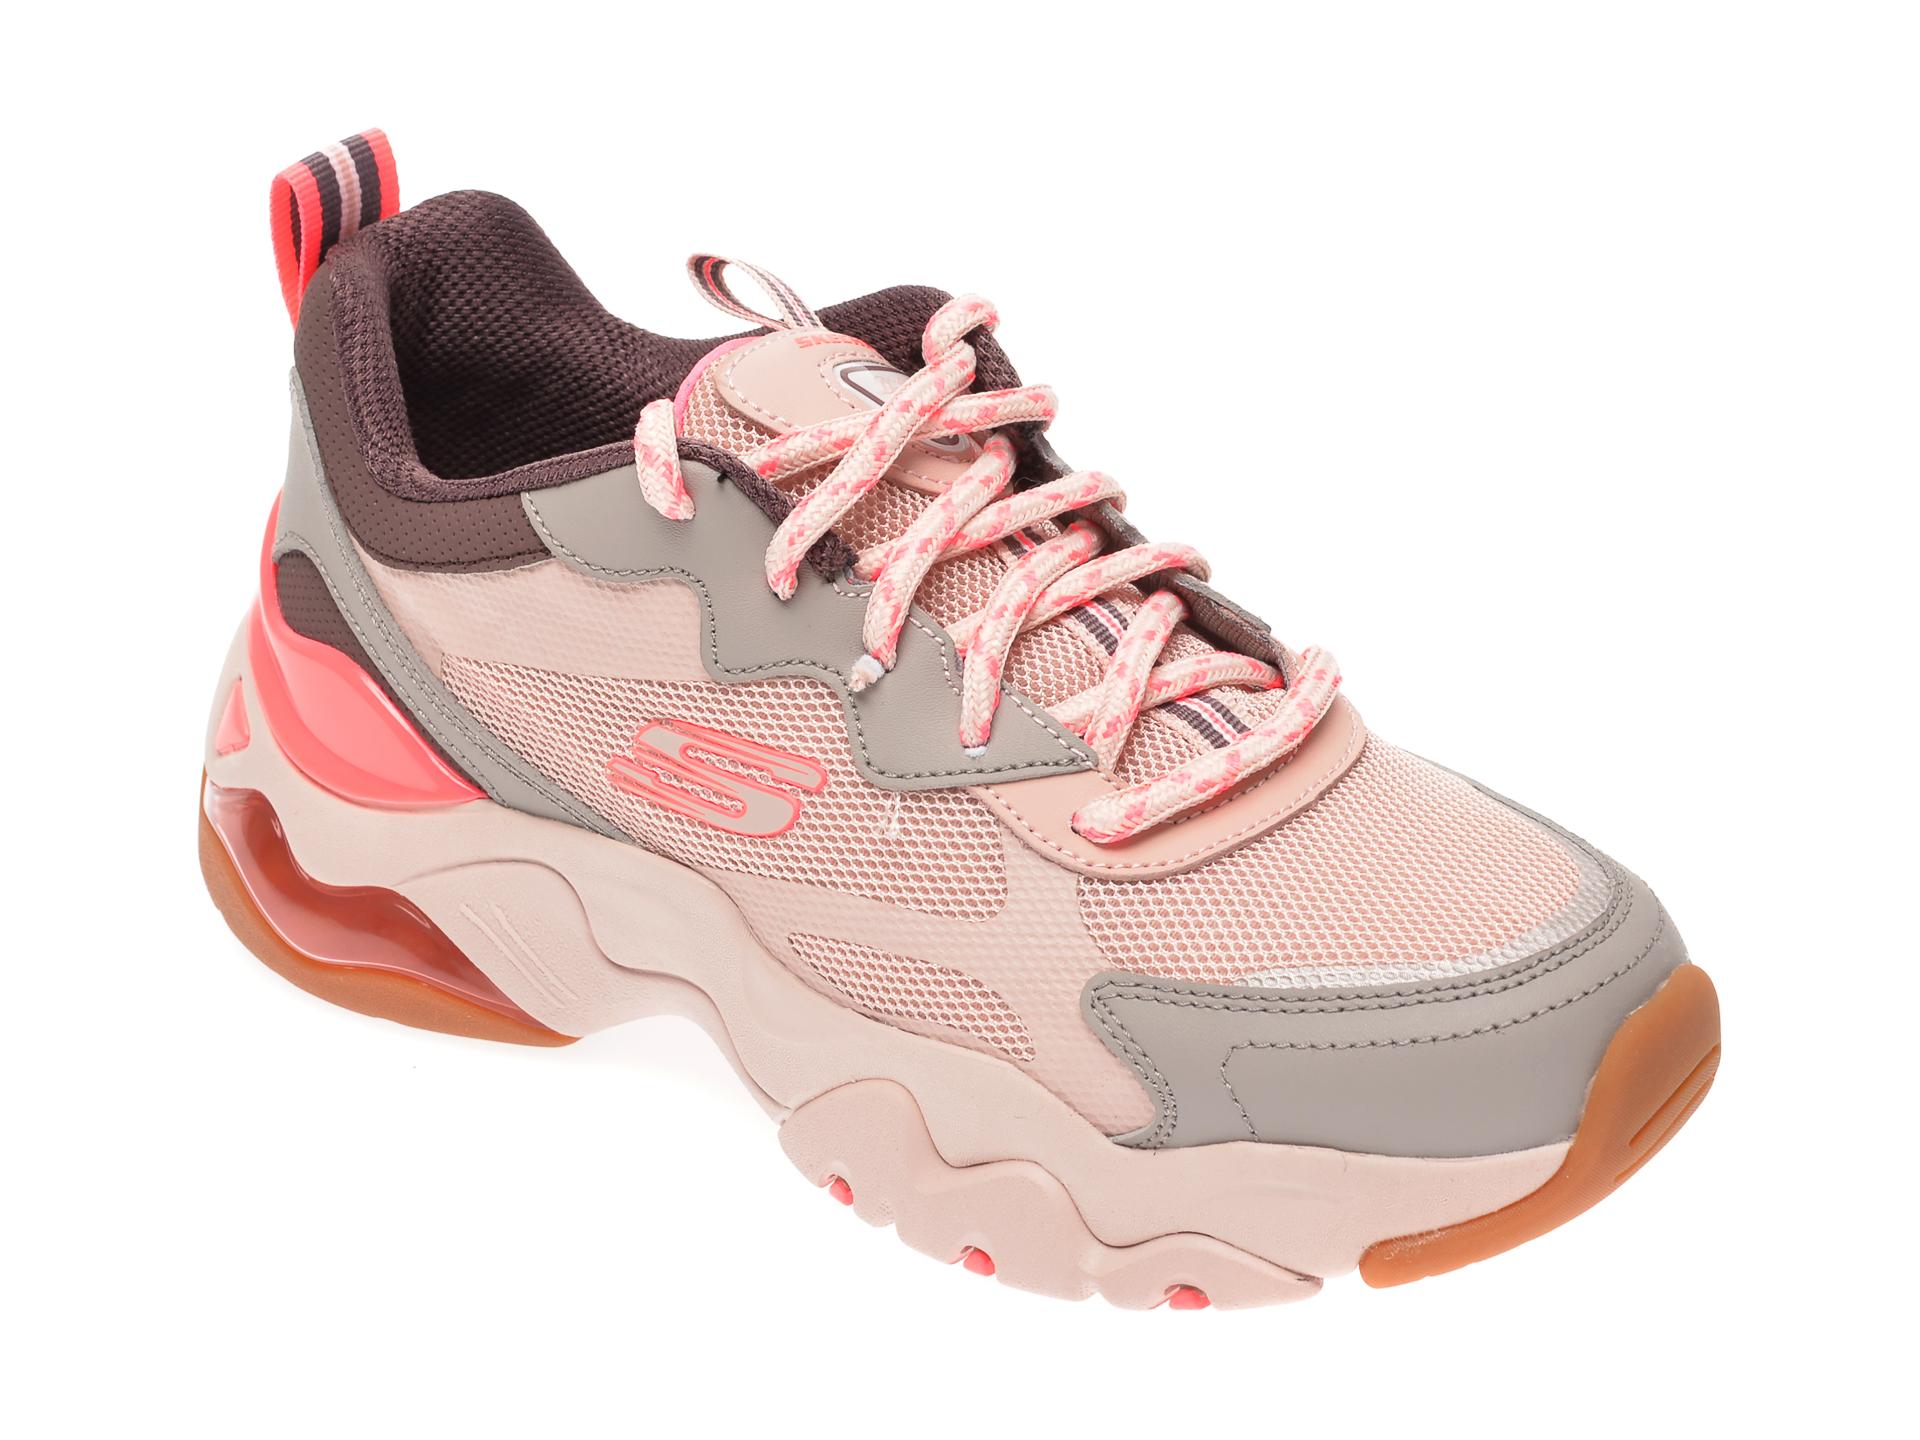 Pantofi sportSKECHERS multicolor, Dlites 3.0 Air, din material textil si piele naturala imagine